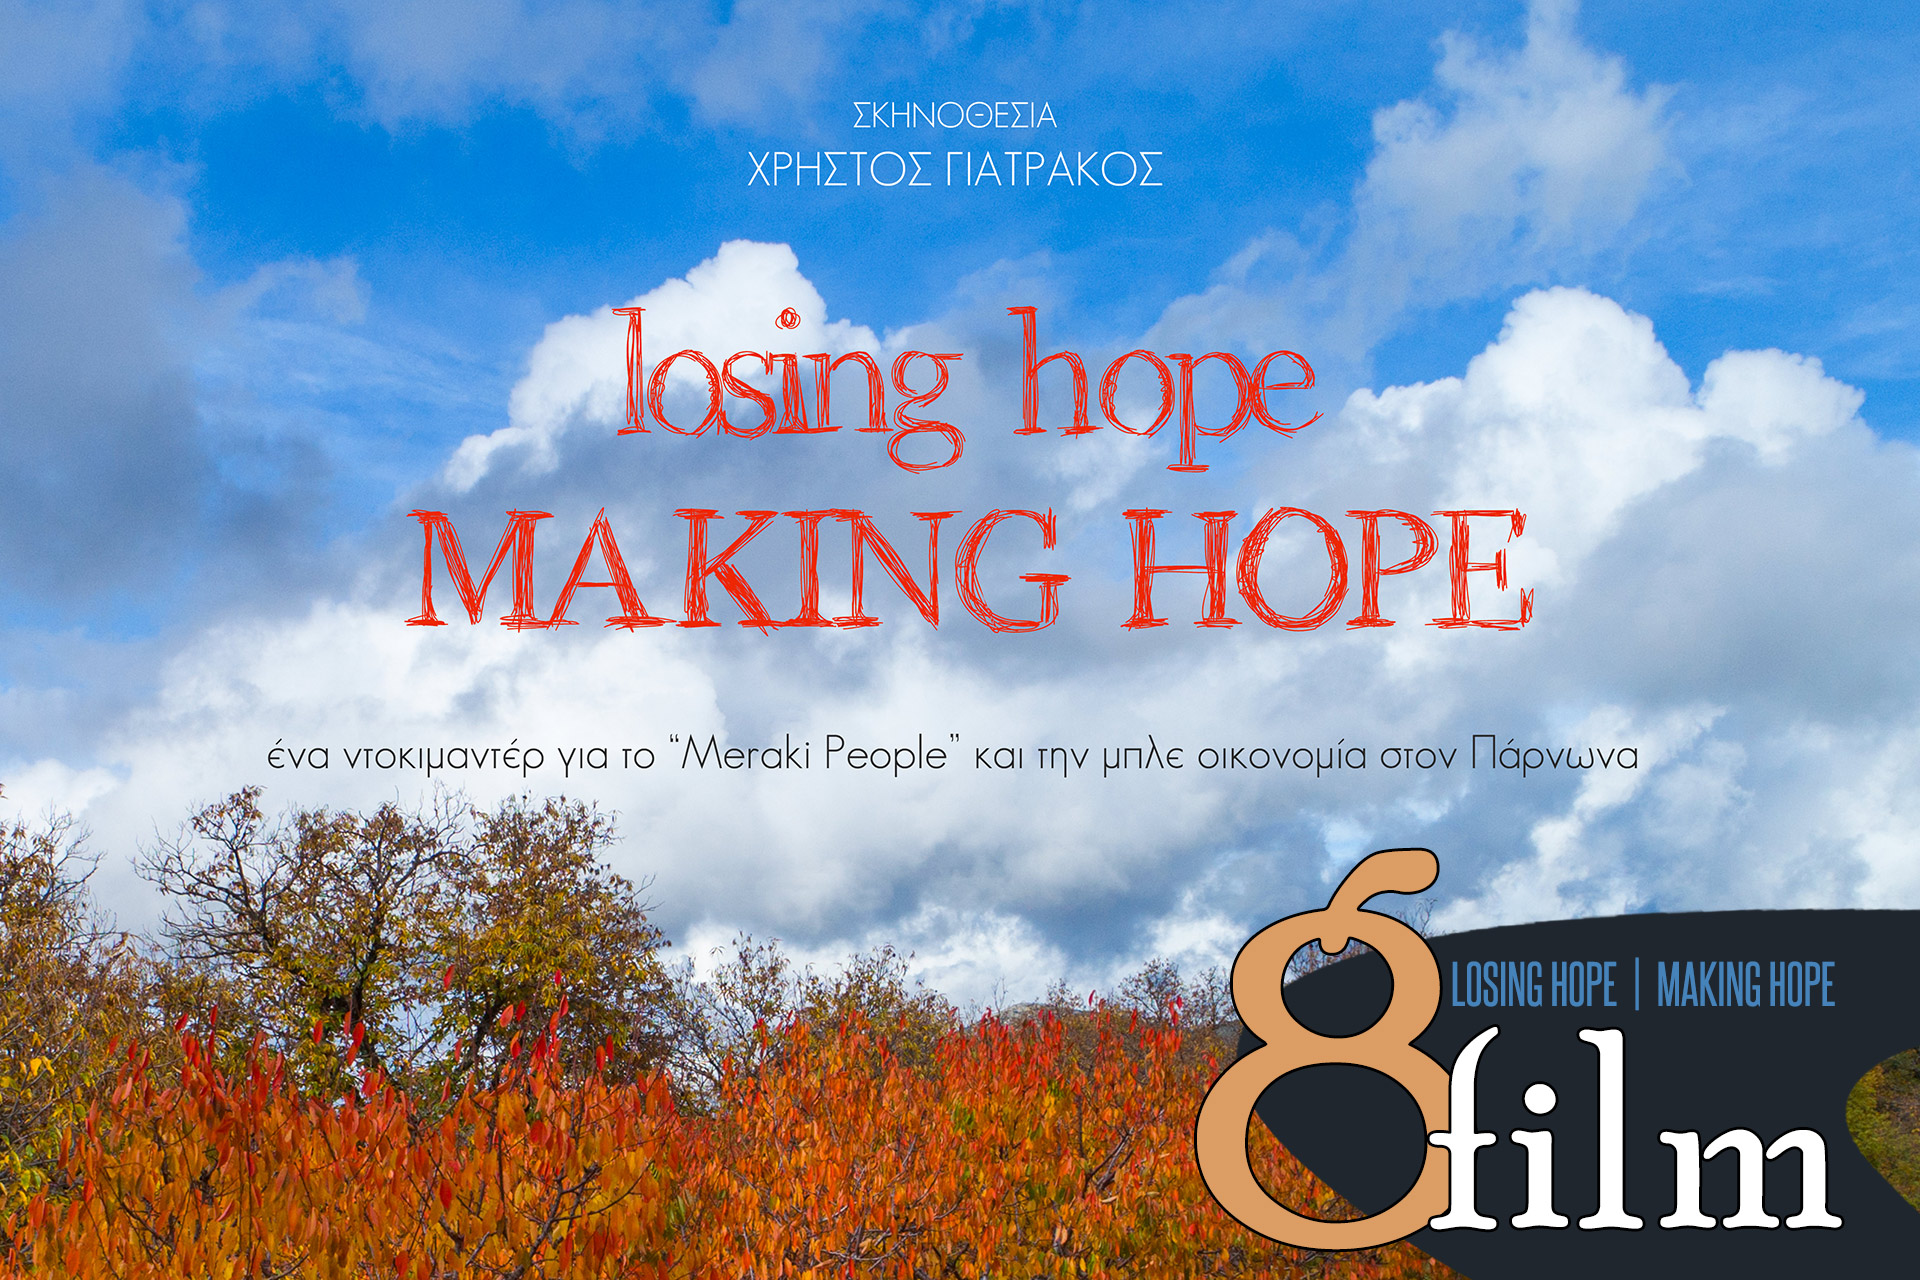 8FILM-LOSING-HOPE-MAKING-HOPE